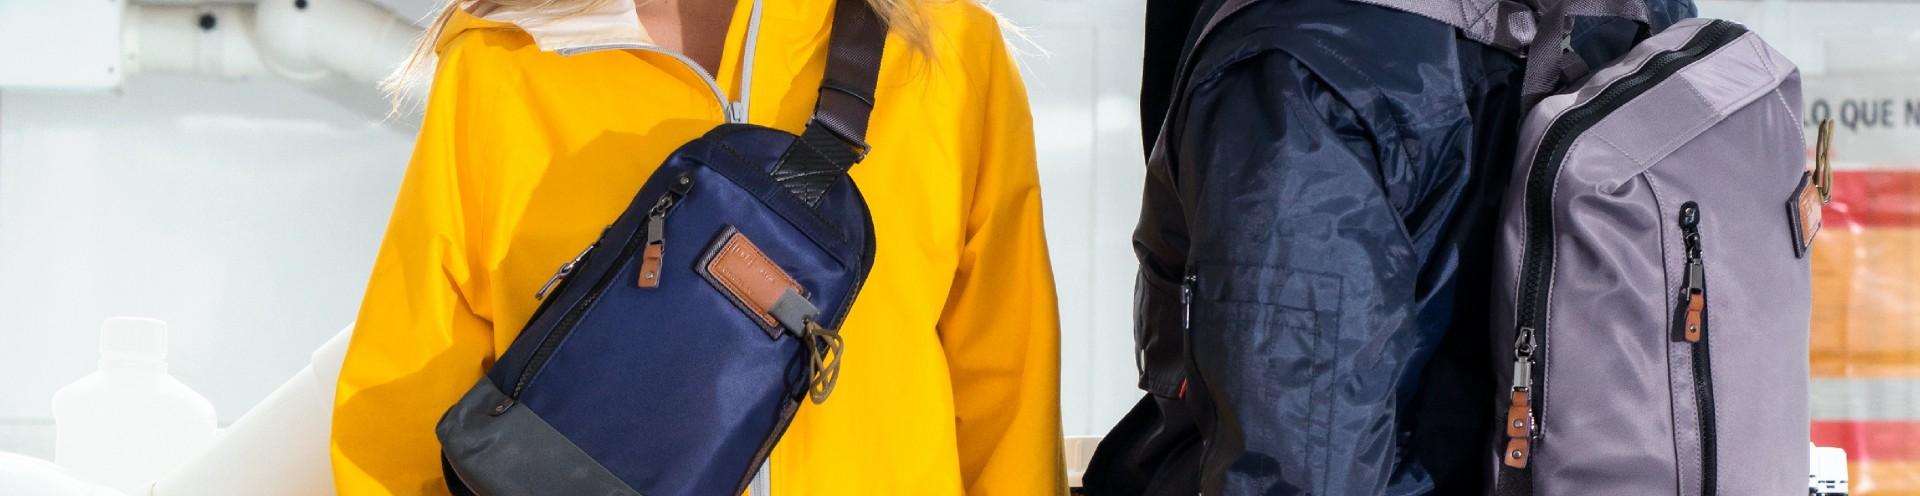 Women's Leather Waist Bags Customizable